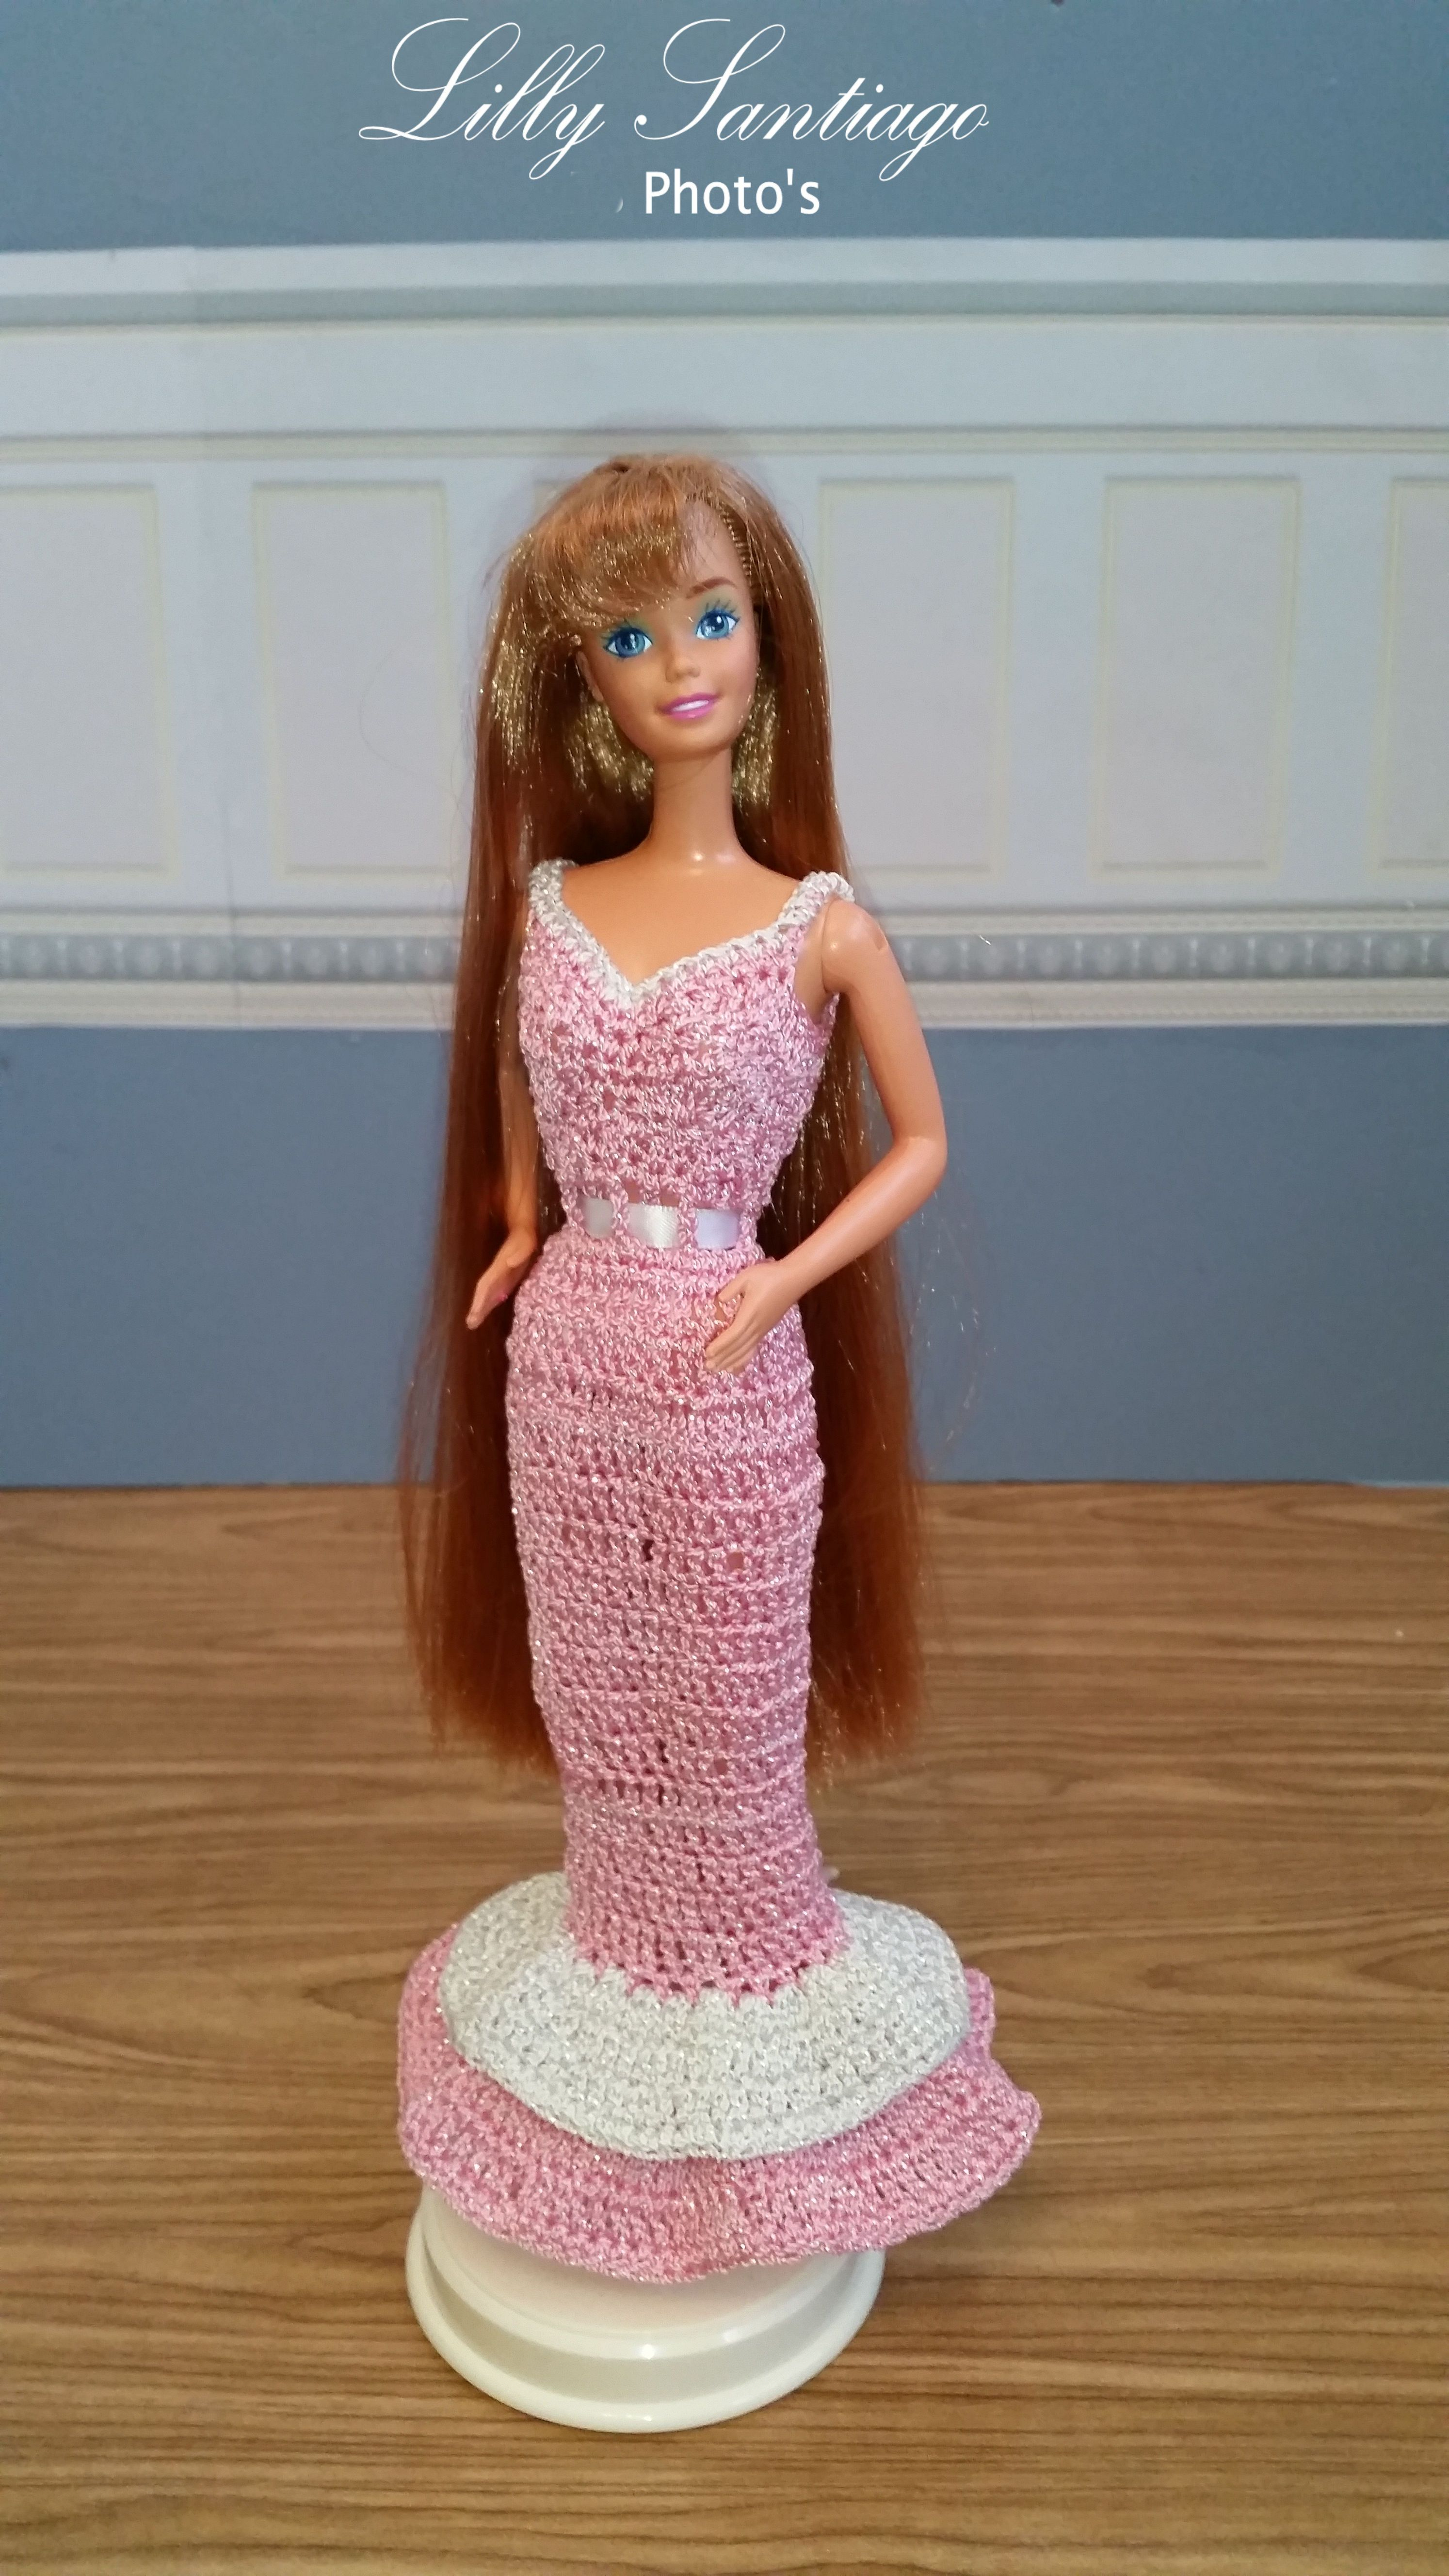 Crochet dress by Lilly Santiago   Barbia   Pinterest   Juegos de ...